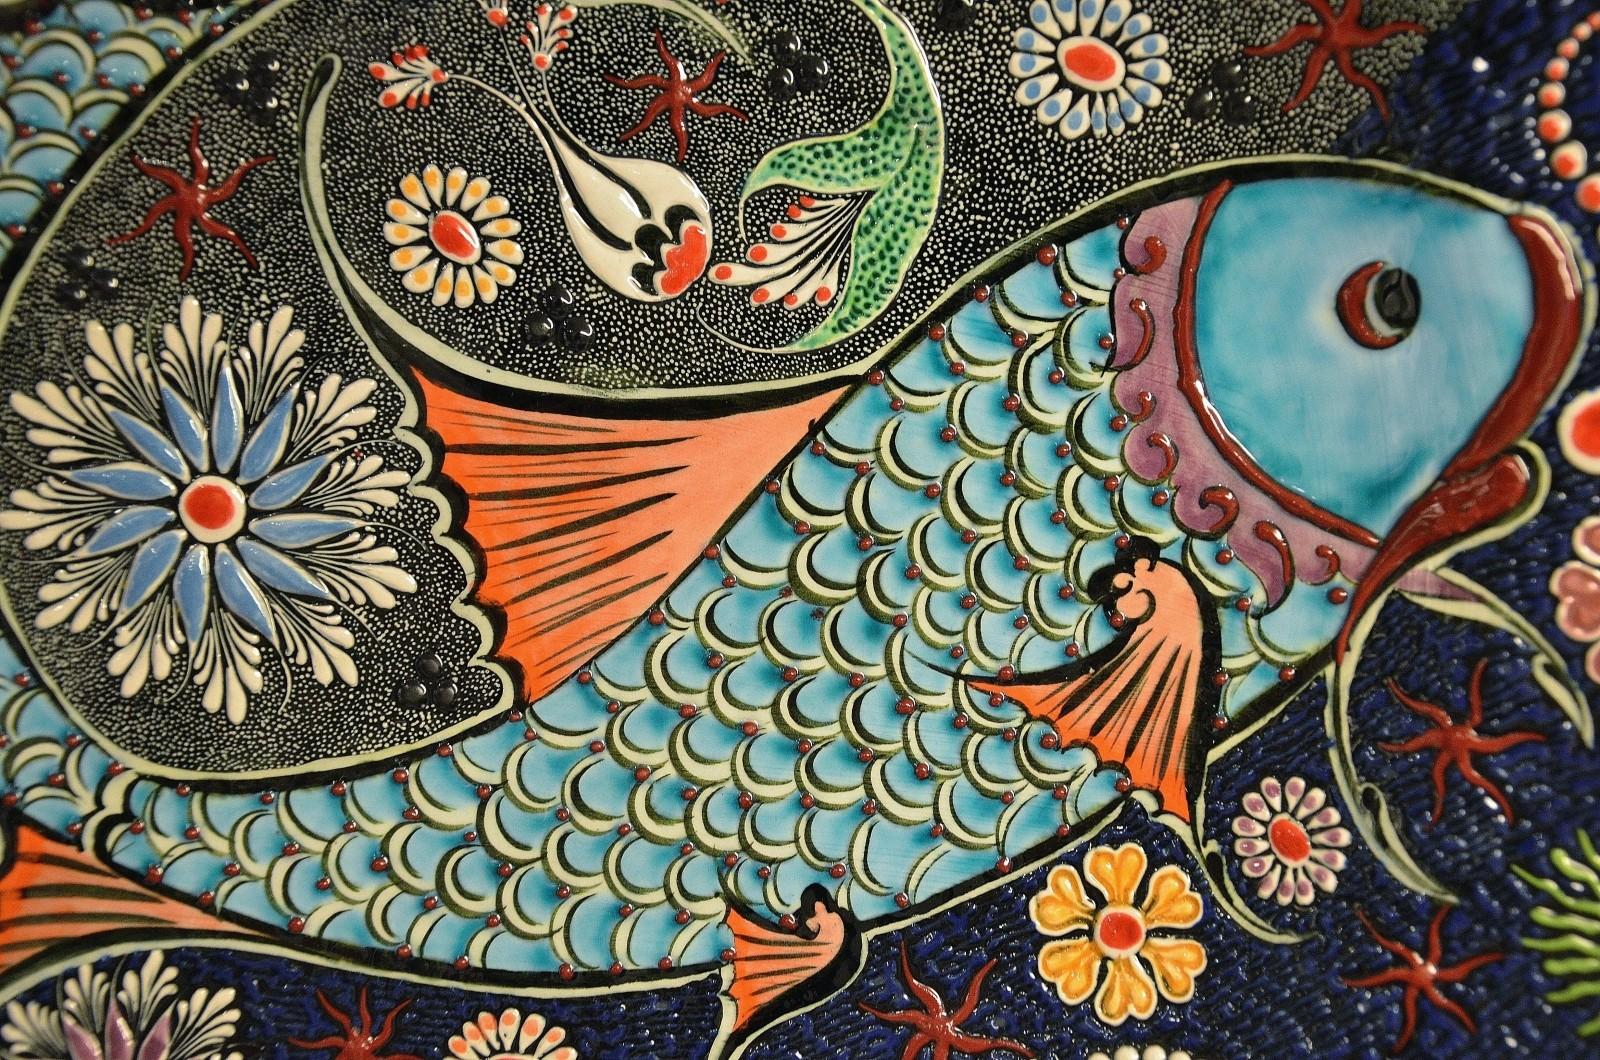 mosaic tile art ceramic colorful decorative - design vlog